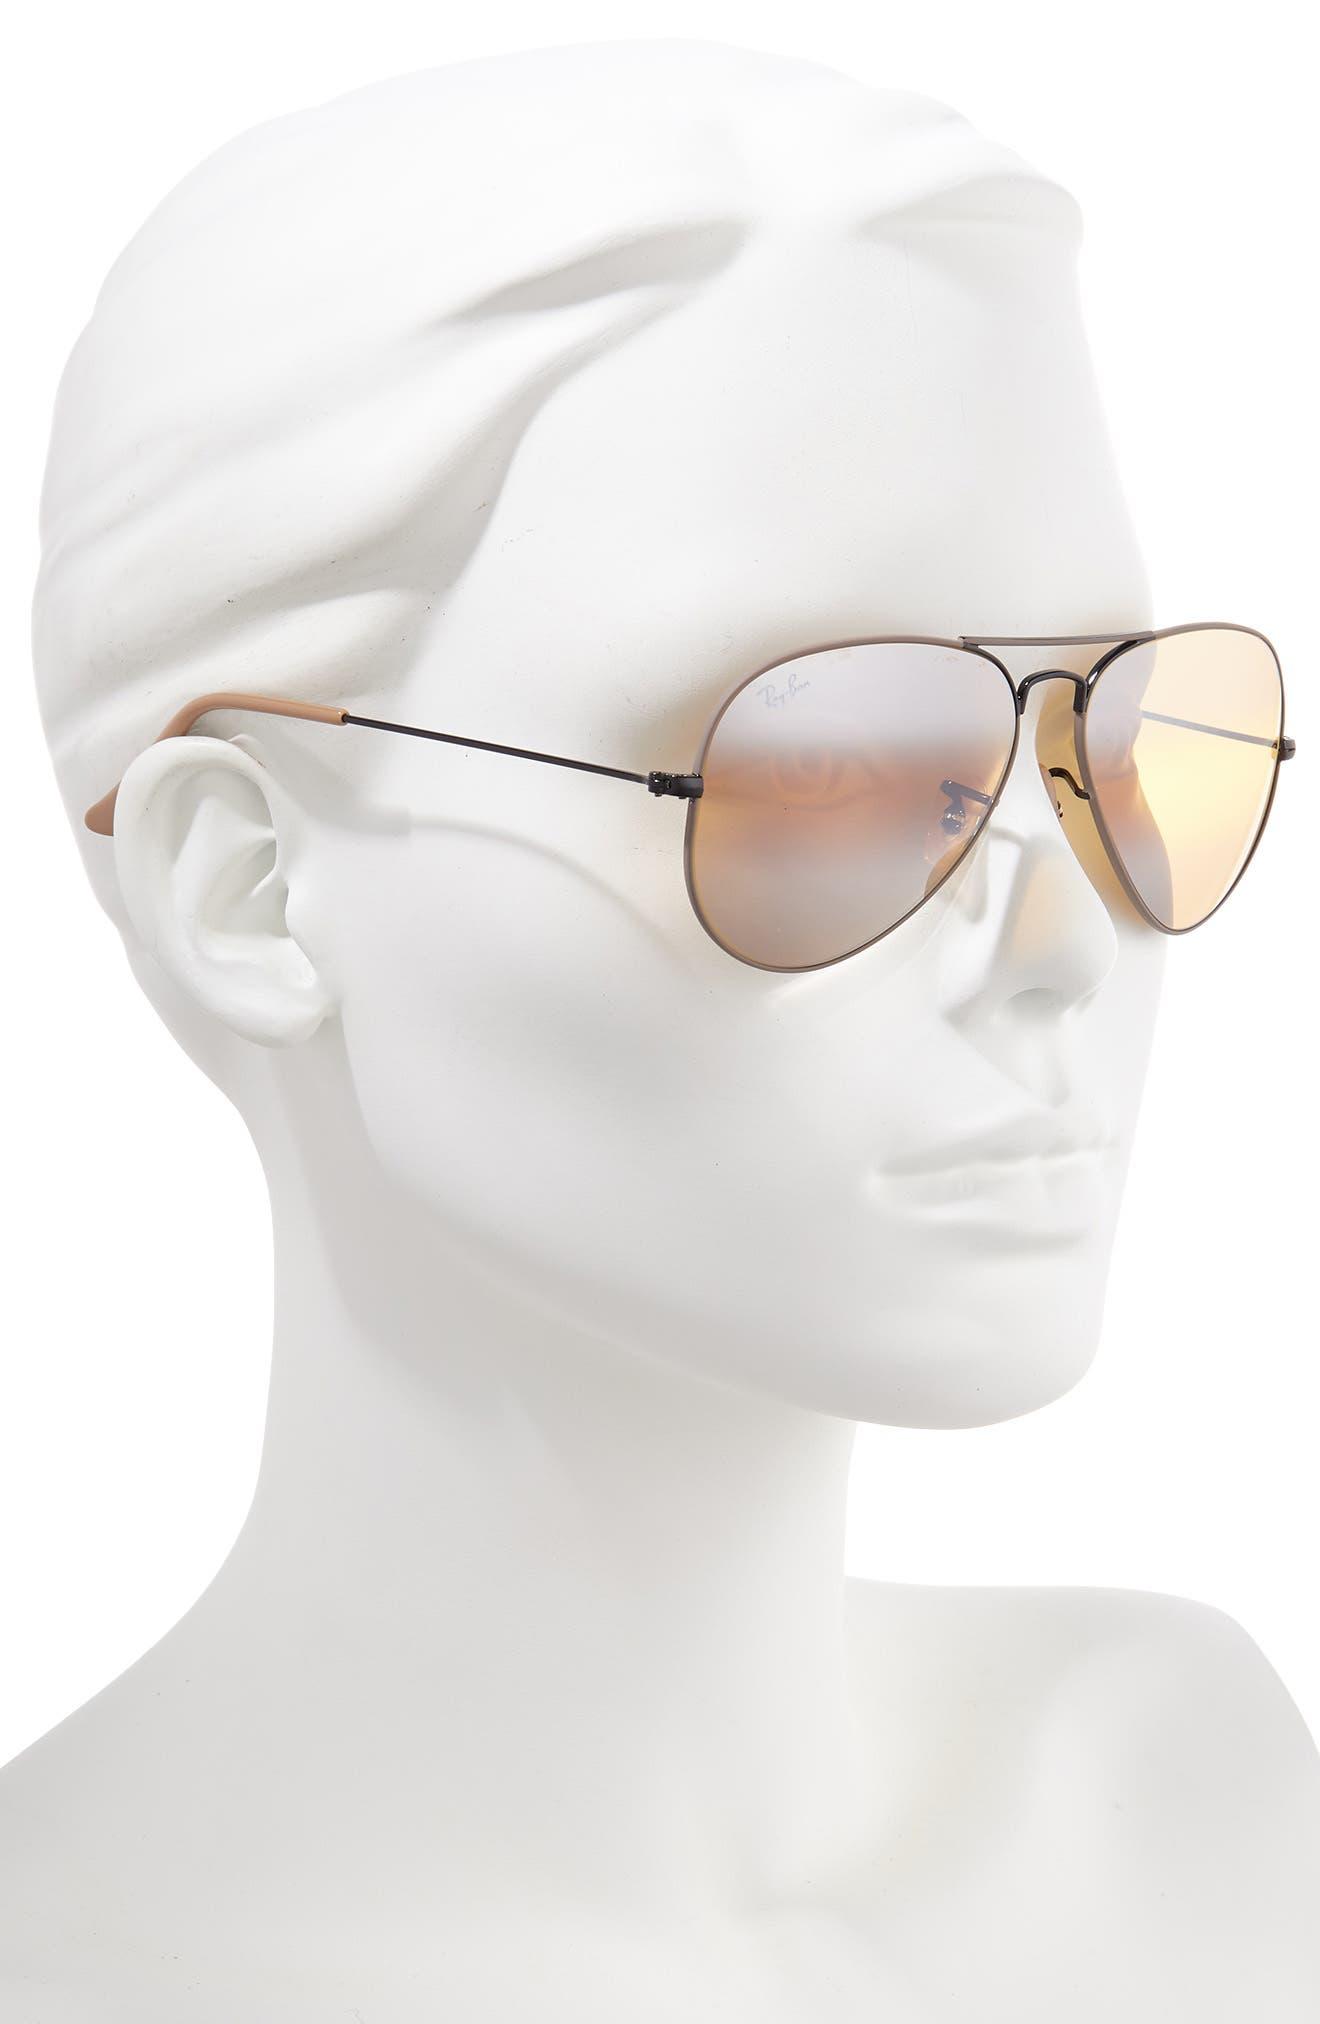 RAY-BAN,                             Standard Original 58mm Aviator Sunglasses,                             Alternate thumbnail 2, color,                             BEIGE/ BLACK MIRROR